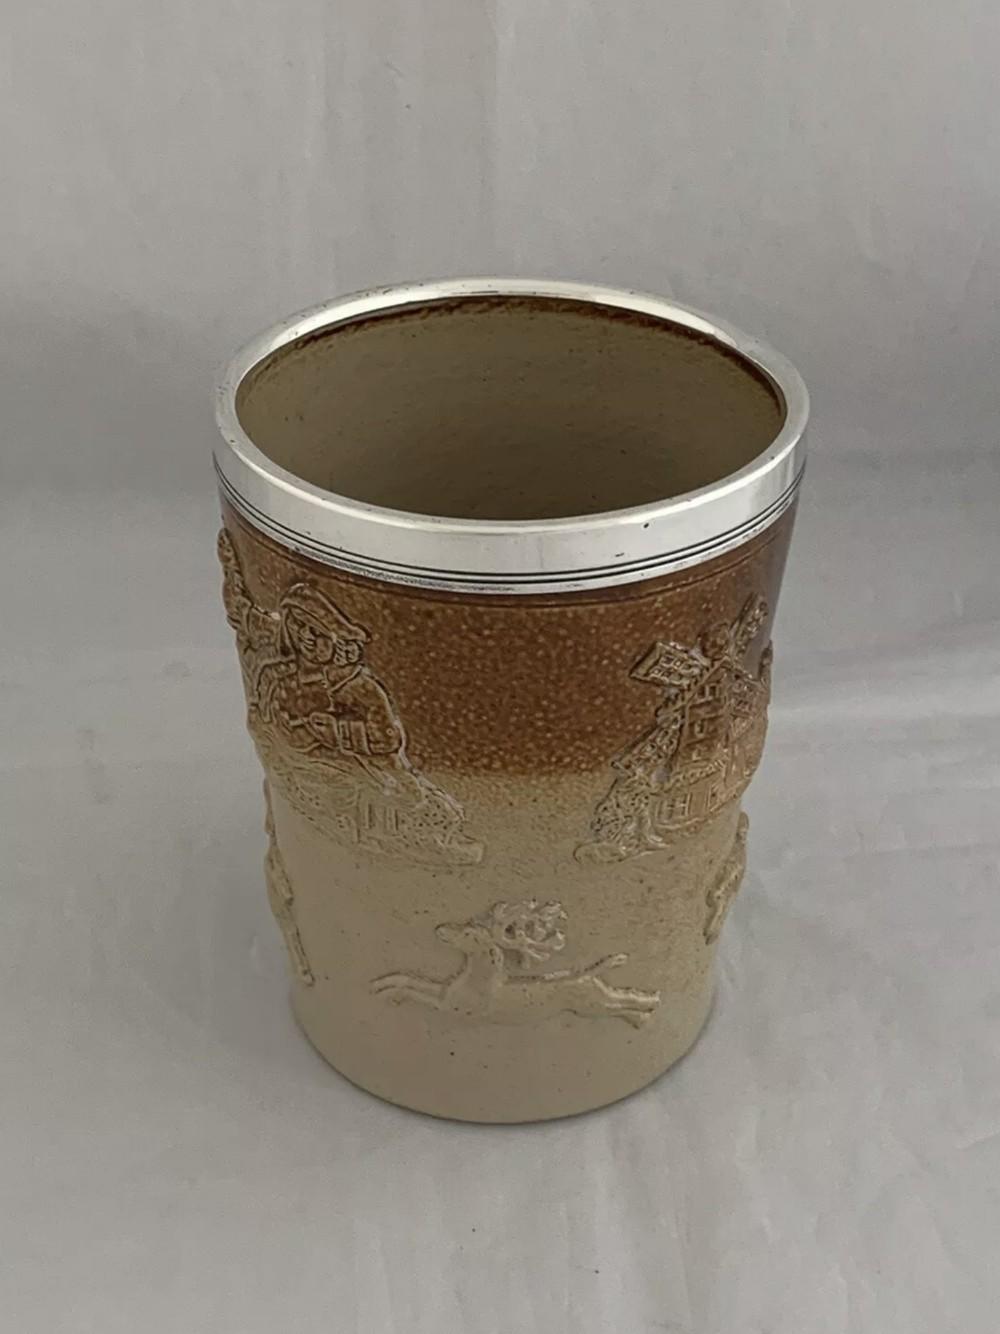 victorian antique silver royal doulton pint beaker 1880 london sterling silver